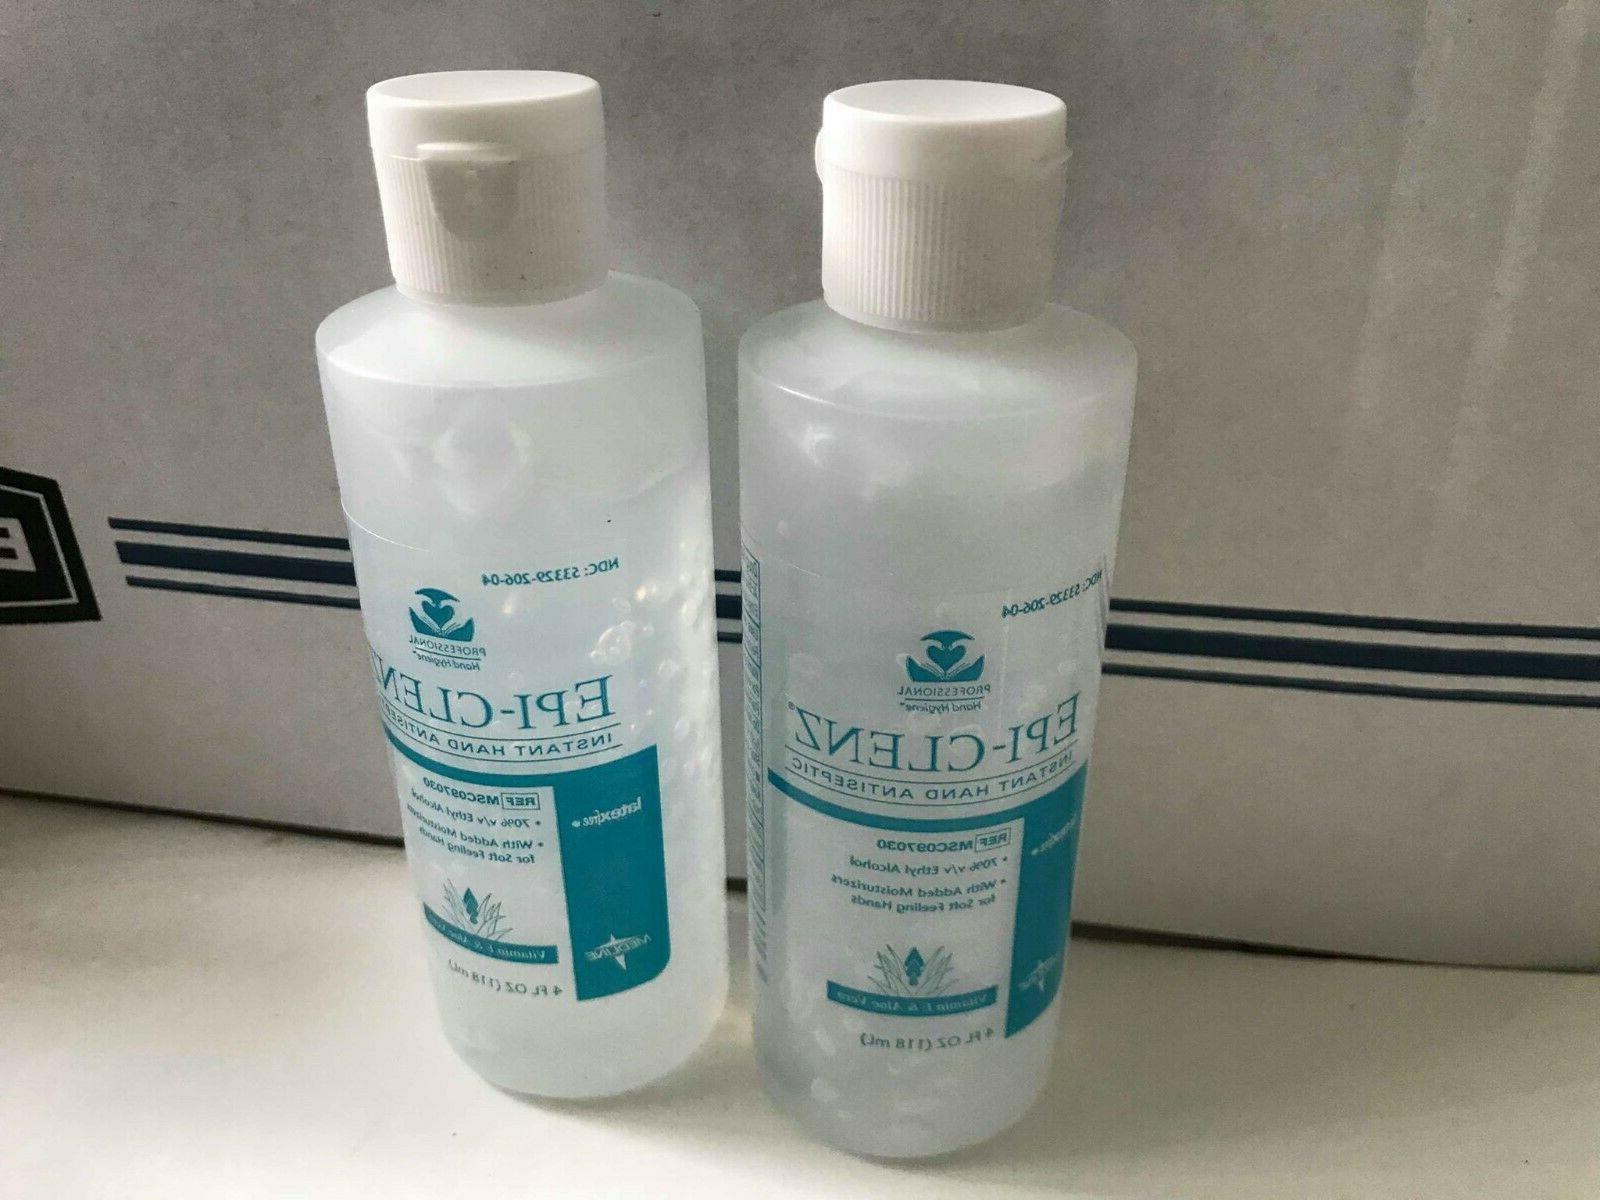 Epi-Clenz Hand Antiseptic moisturizers 4 fl